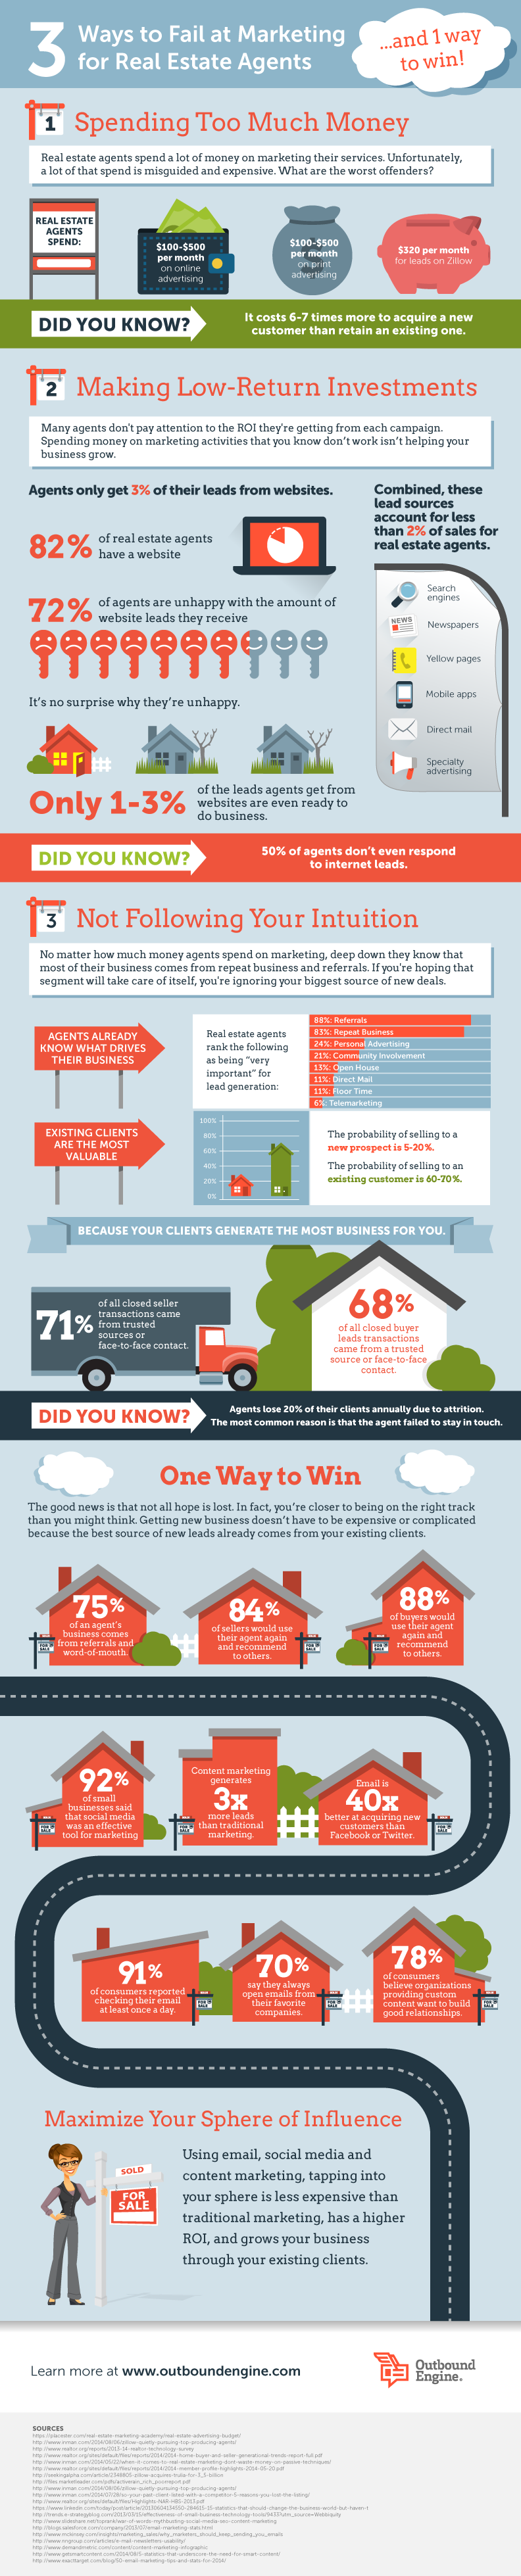 3 Ways Real Estate Agents Fail at Marketing